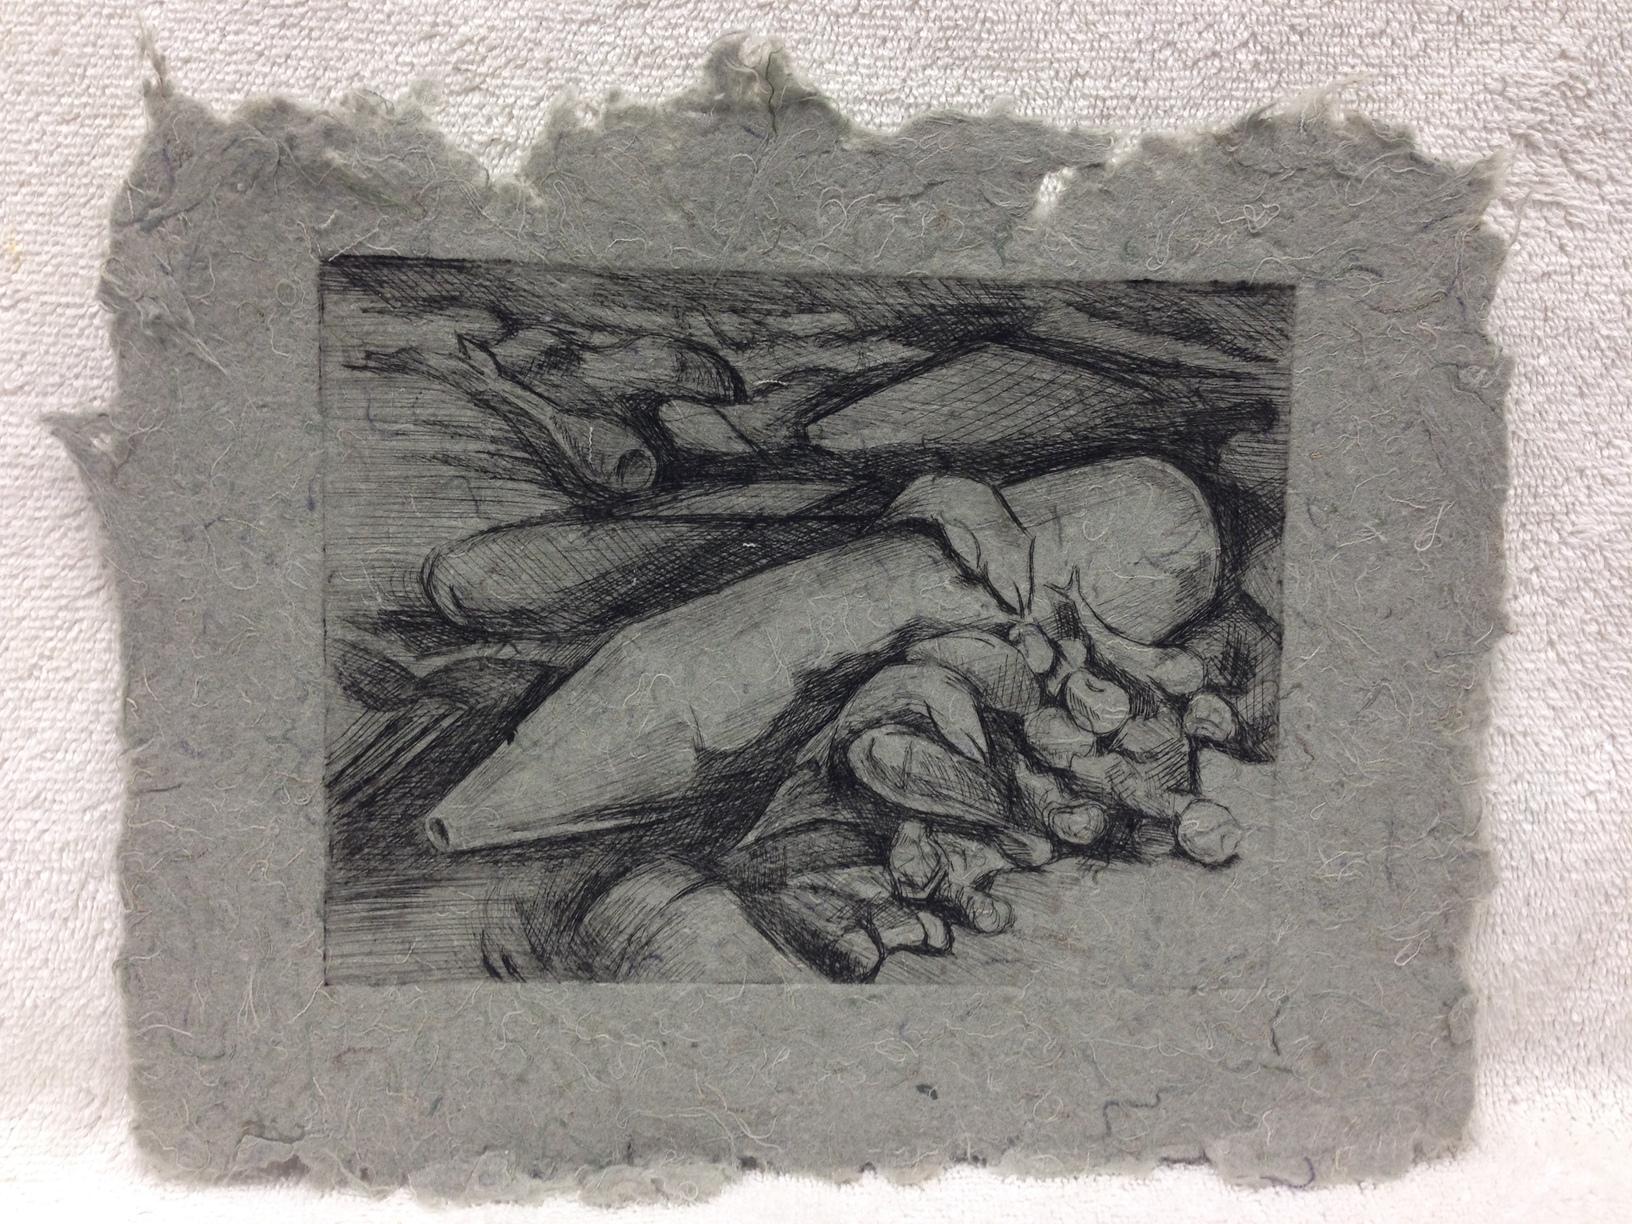 David Keefe Marines - Iraq _Fish Tank Shells Mortars_ 2011 Drypoint etching on Handmade Paper from military uniforms 8 x 10 PCNJ IMG_1022JPG.jpg